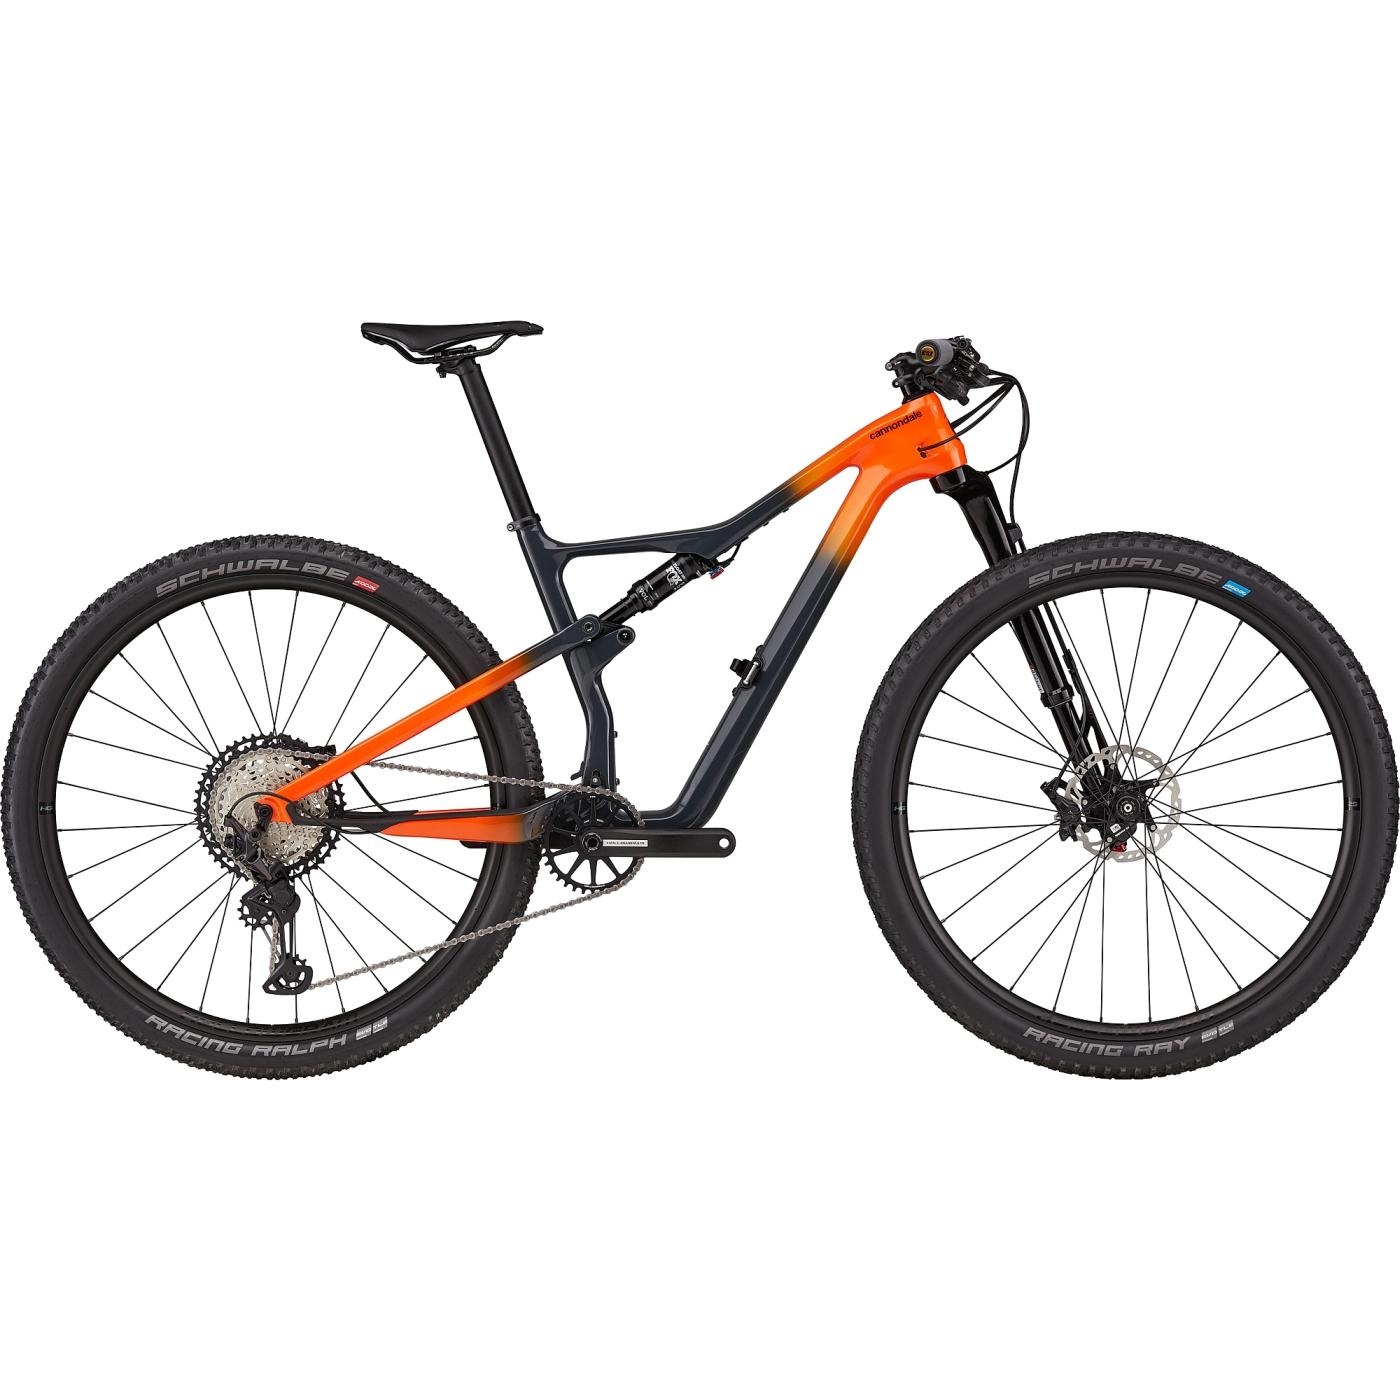 Cannondale SCALPEL CARBON 2 - 29 Zoll Mountainbike - 2021 - Slate Gray